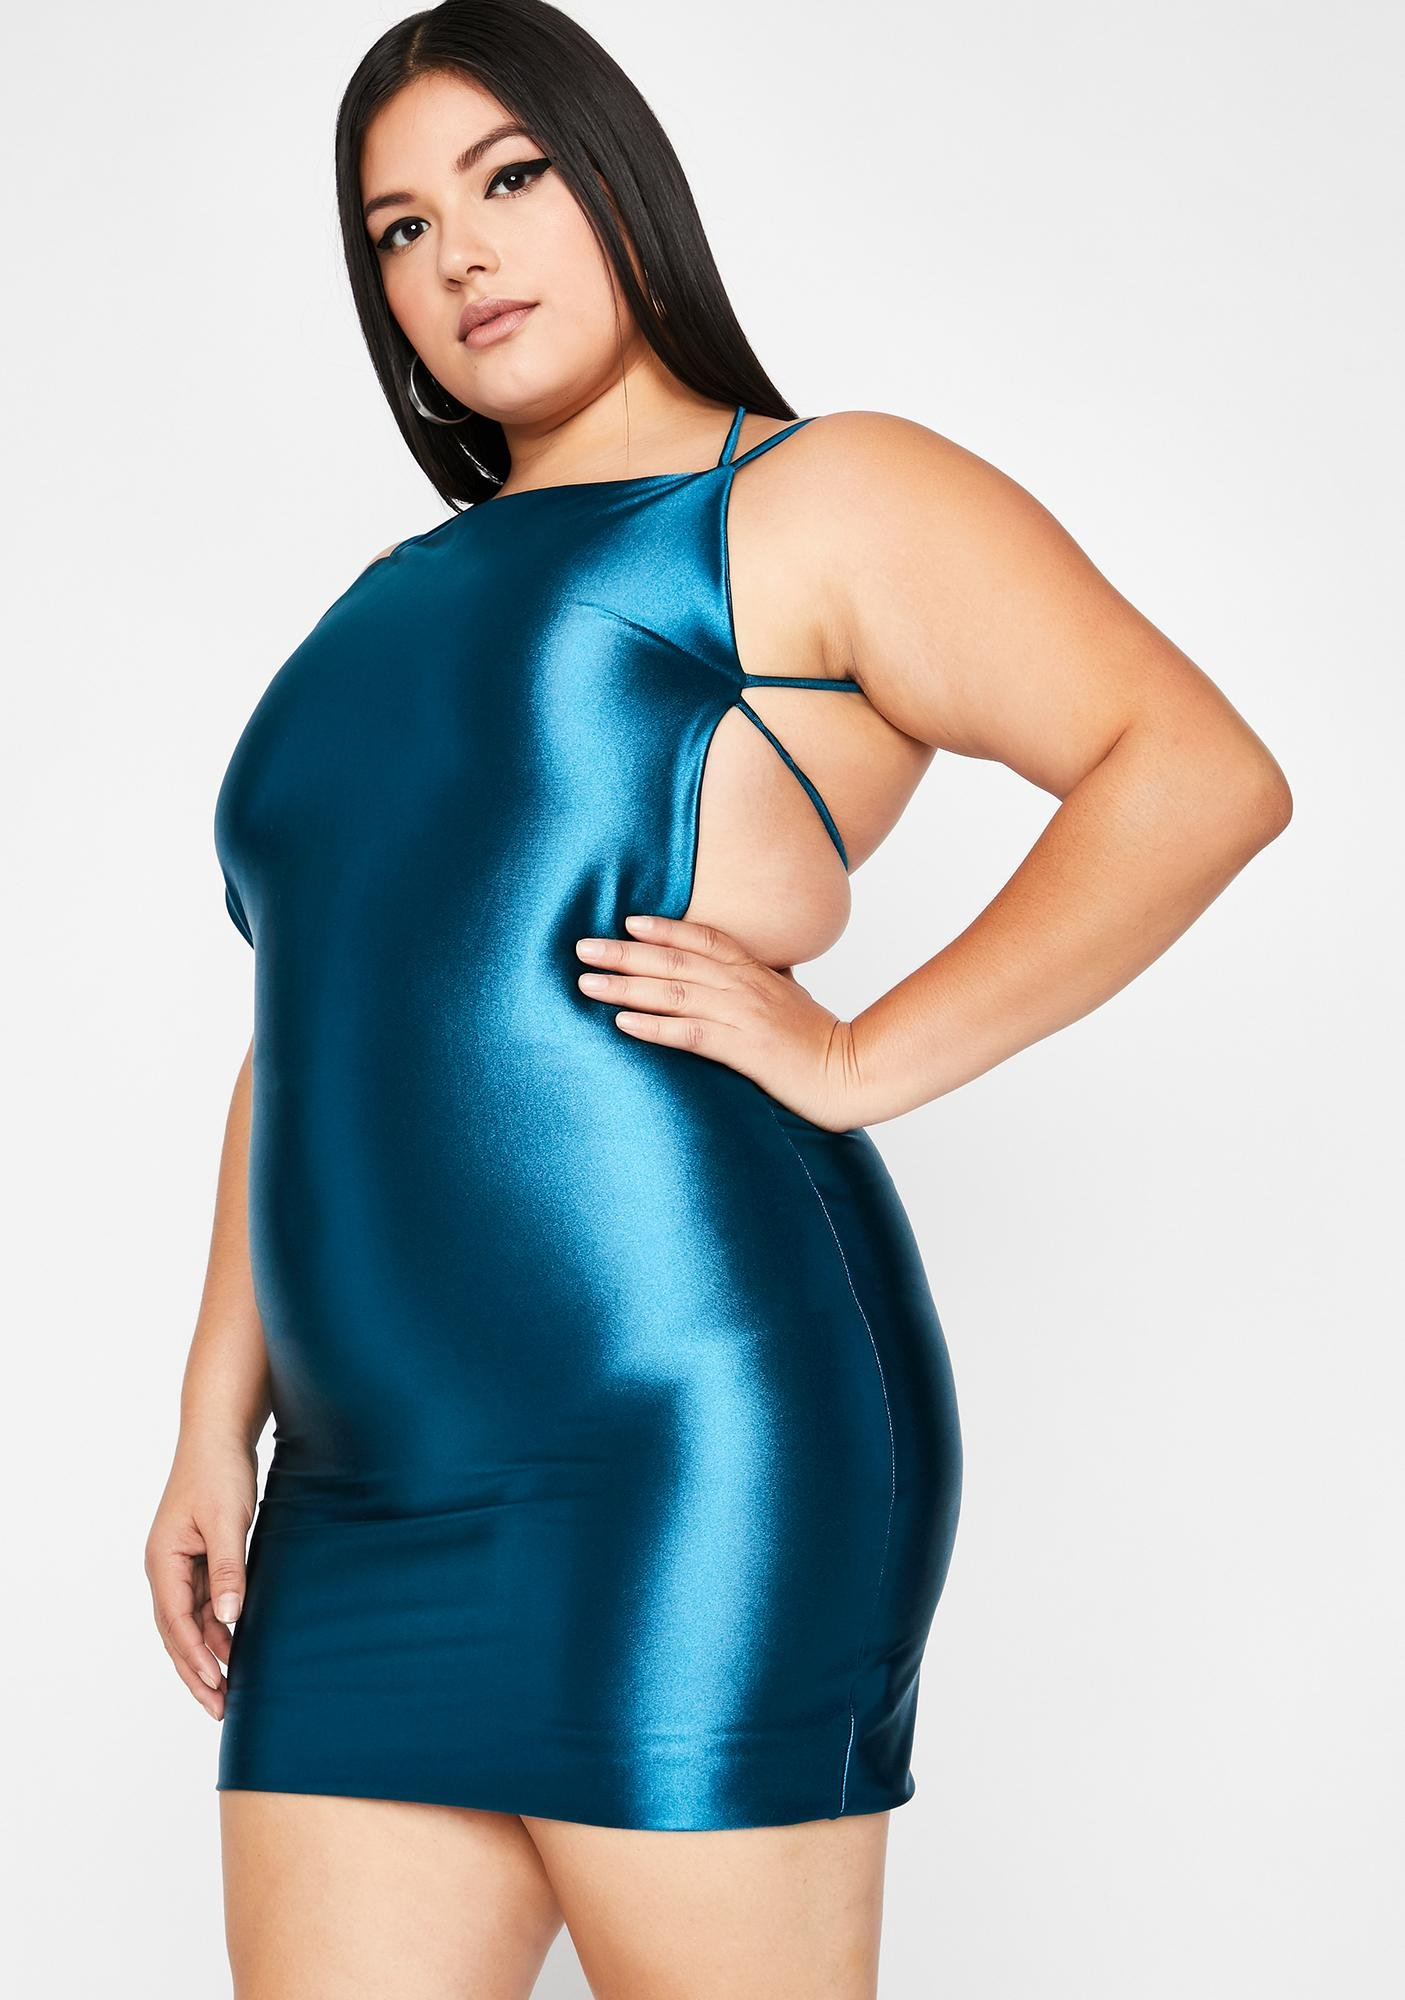 Cash Viral Status Satin Dress